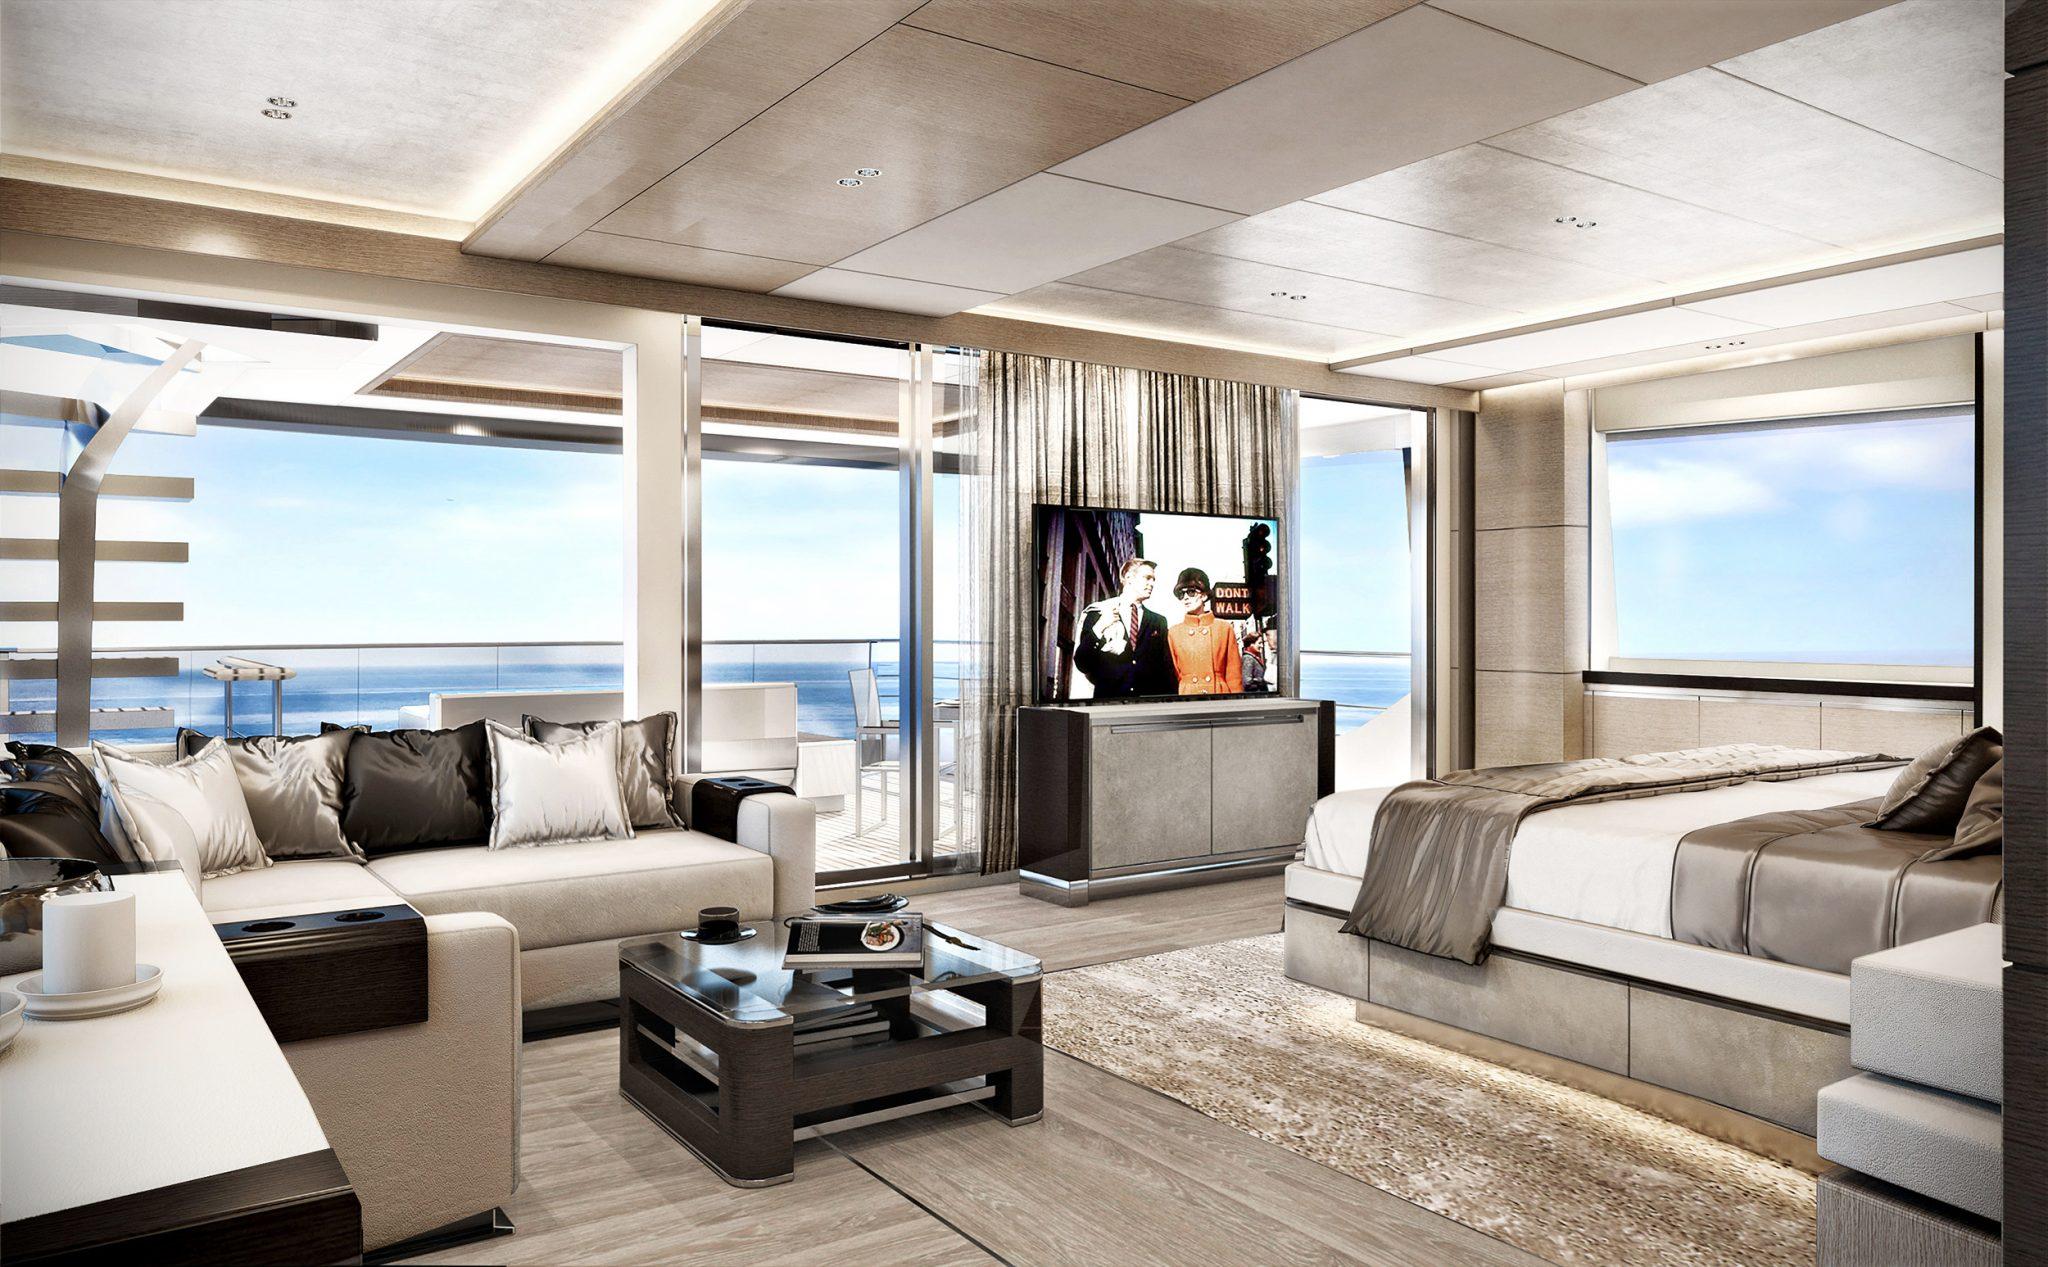 Heysea Asteria 139 Exterior Interior design owners cabin